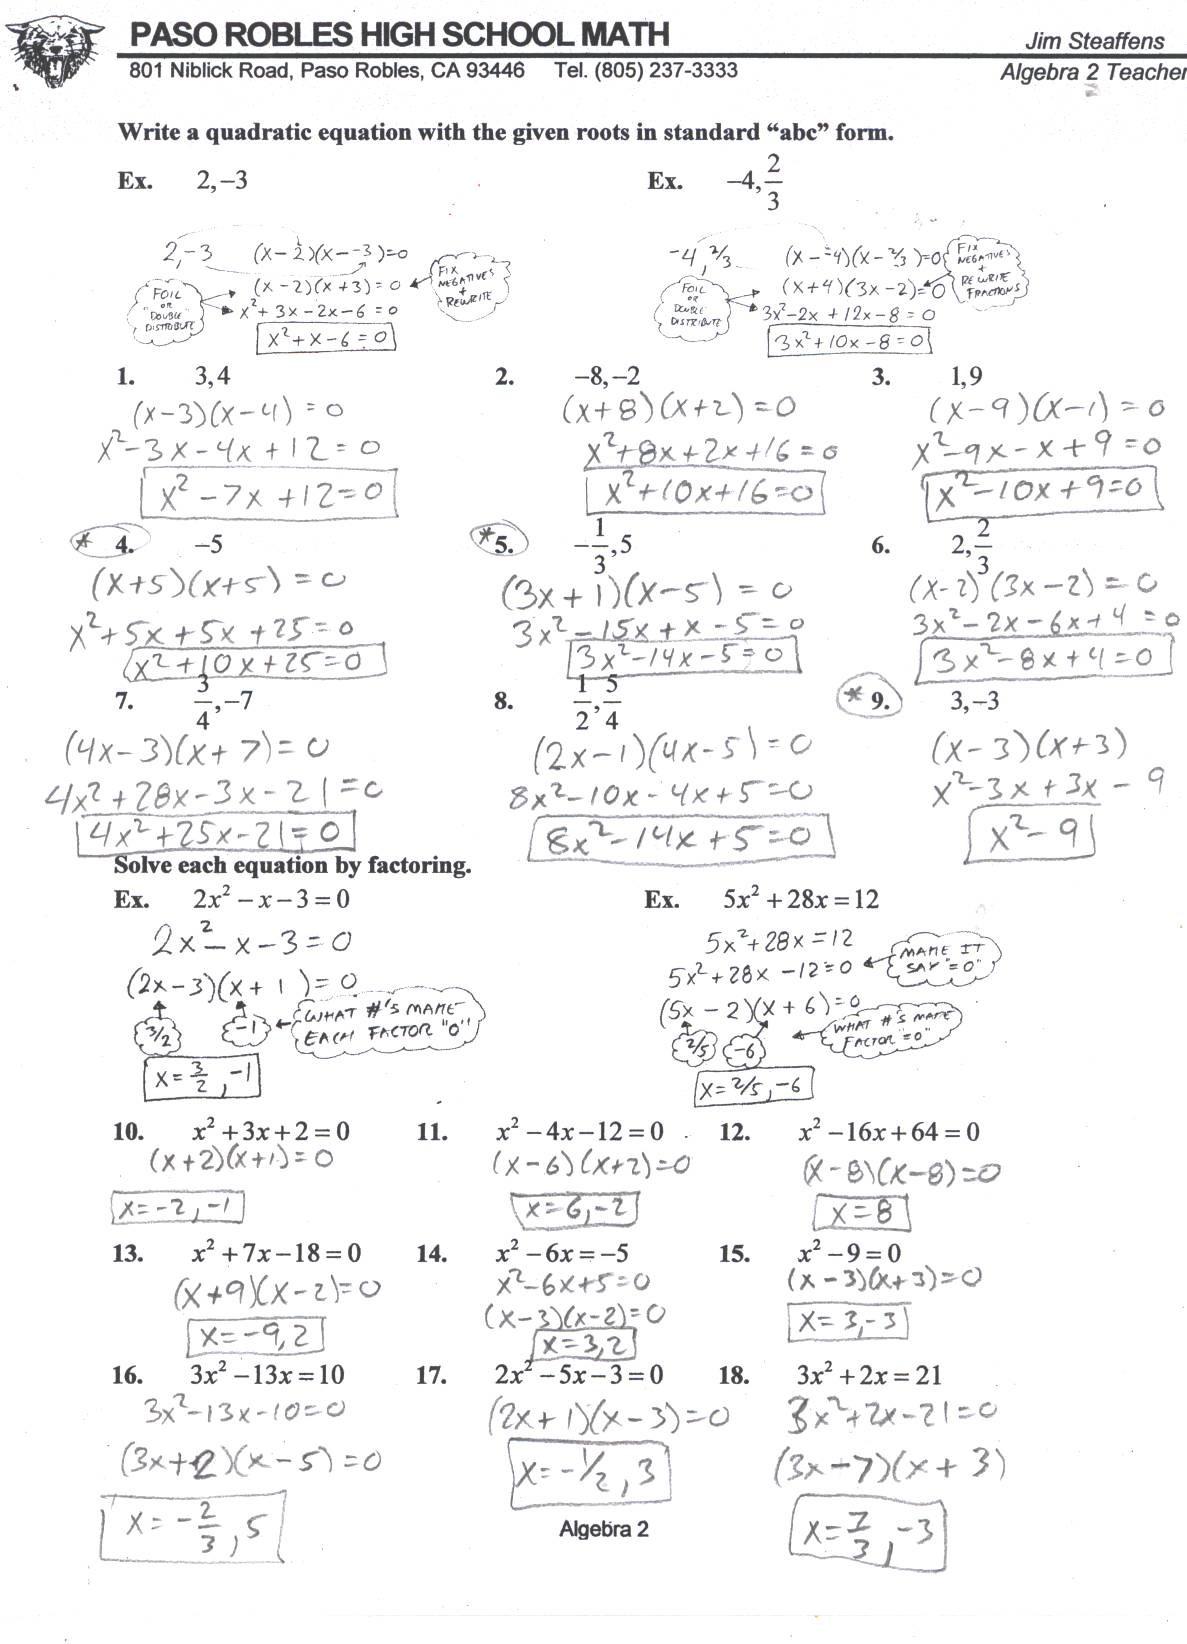 Algebra 2 Worksheet Pdf